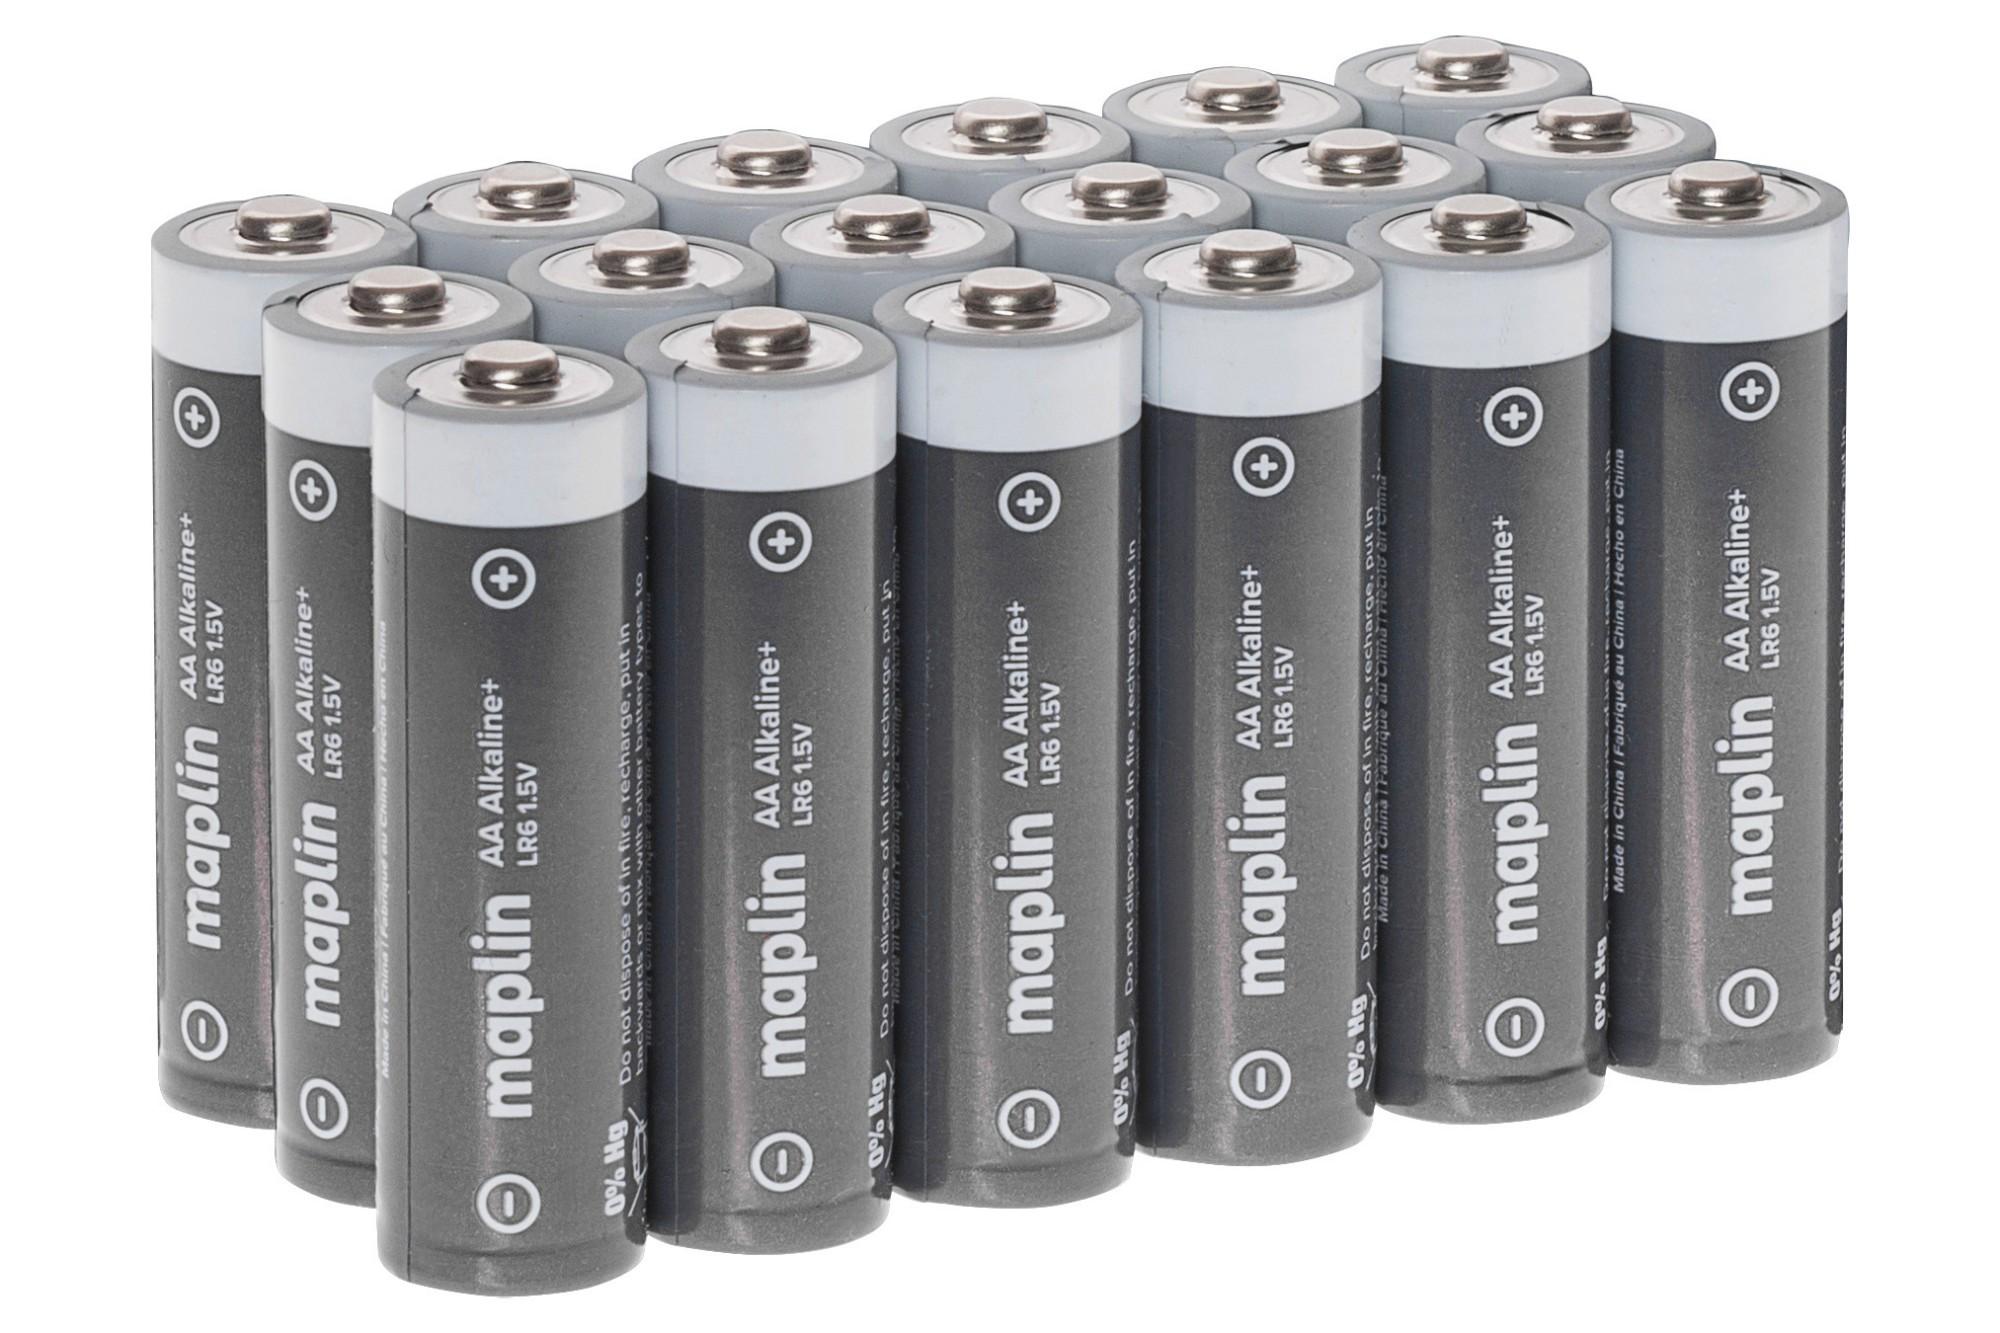 MAPLIN Extra Long Life High-Performance Alkaline AA Batteries - Pack of 18